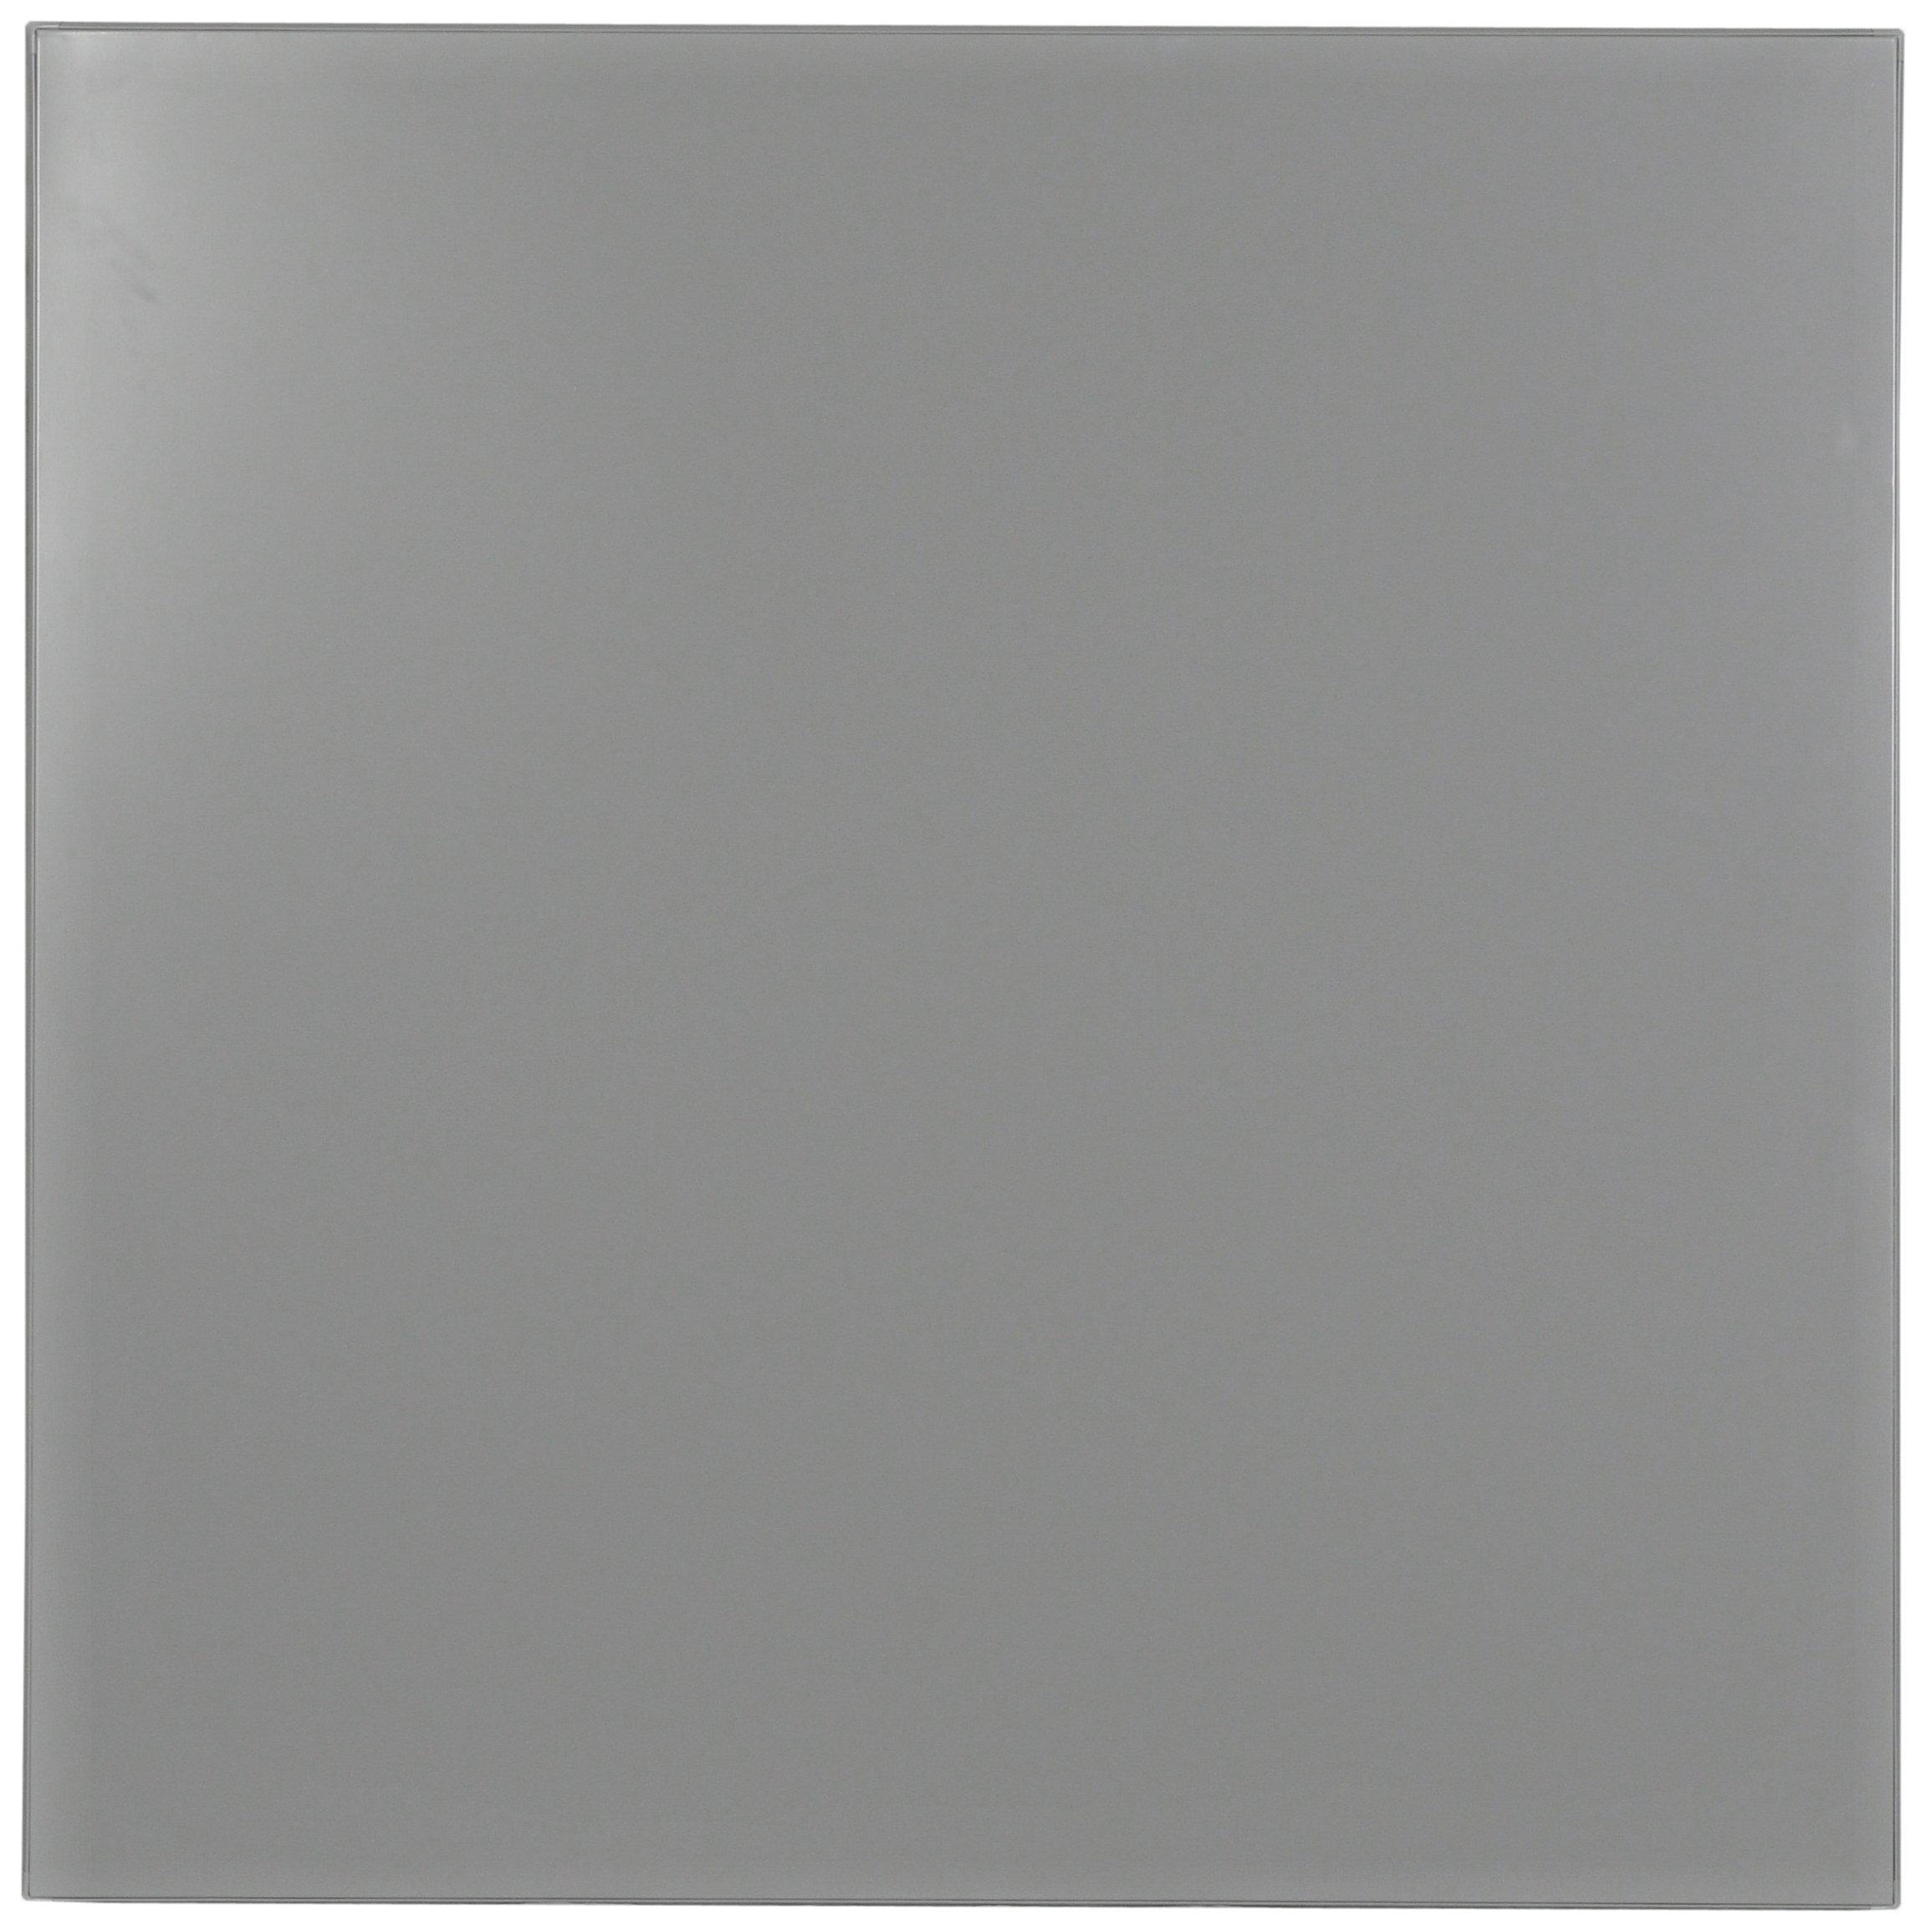 Sanymetal 1142SG Panel, 40'', Sany Grey